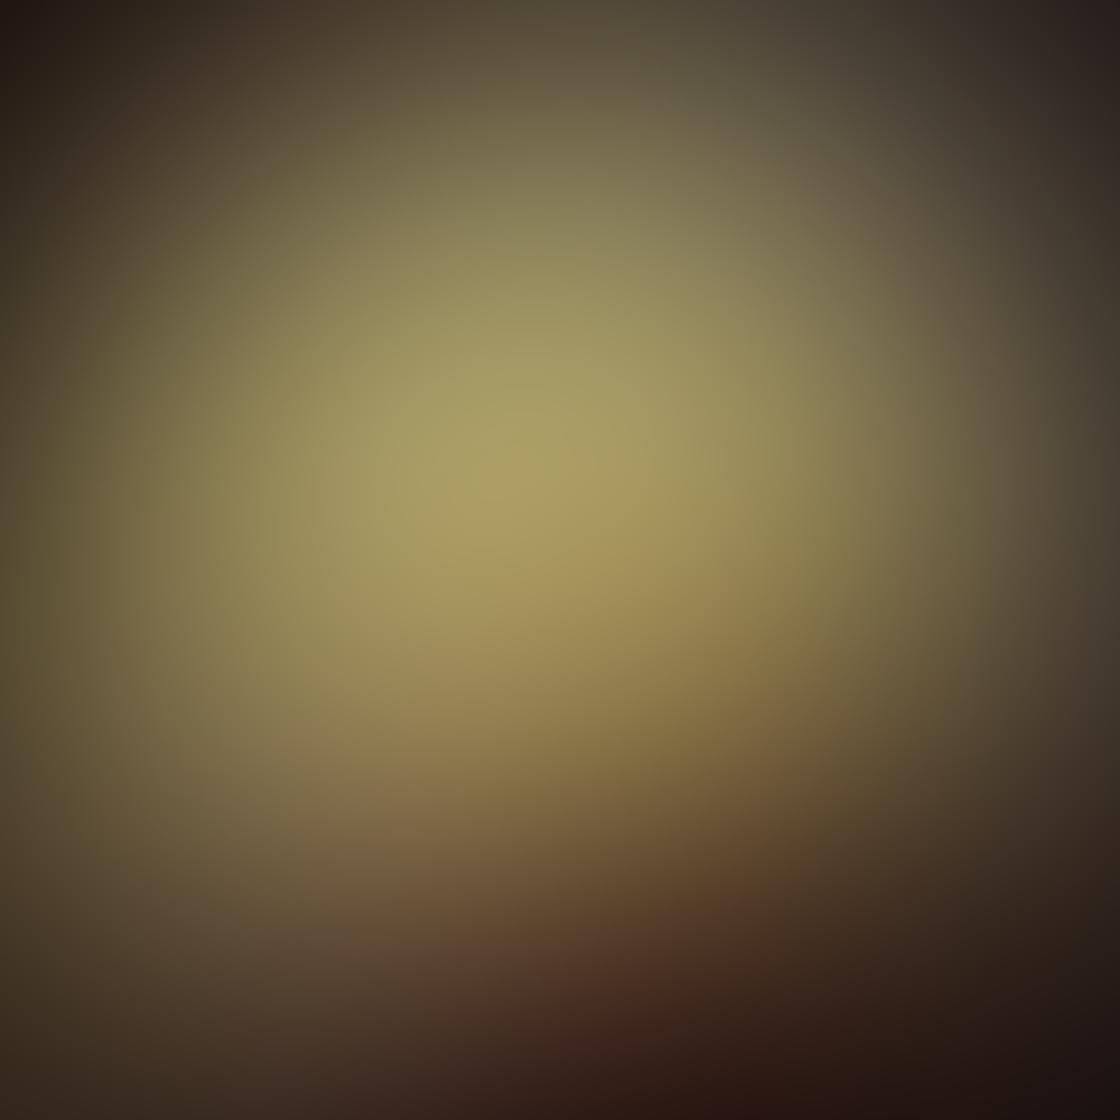 iPhone Photo Perspective 2